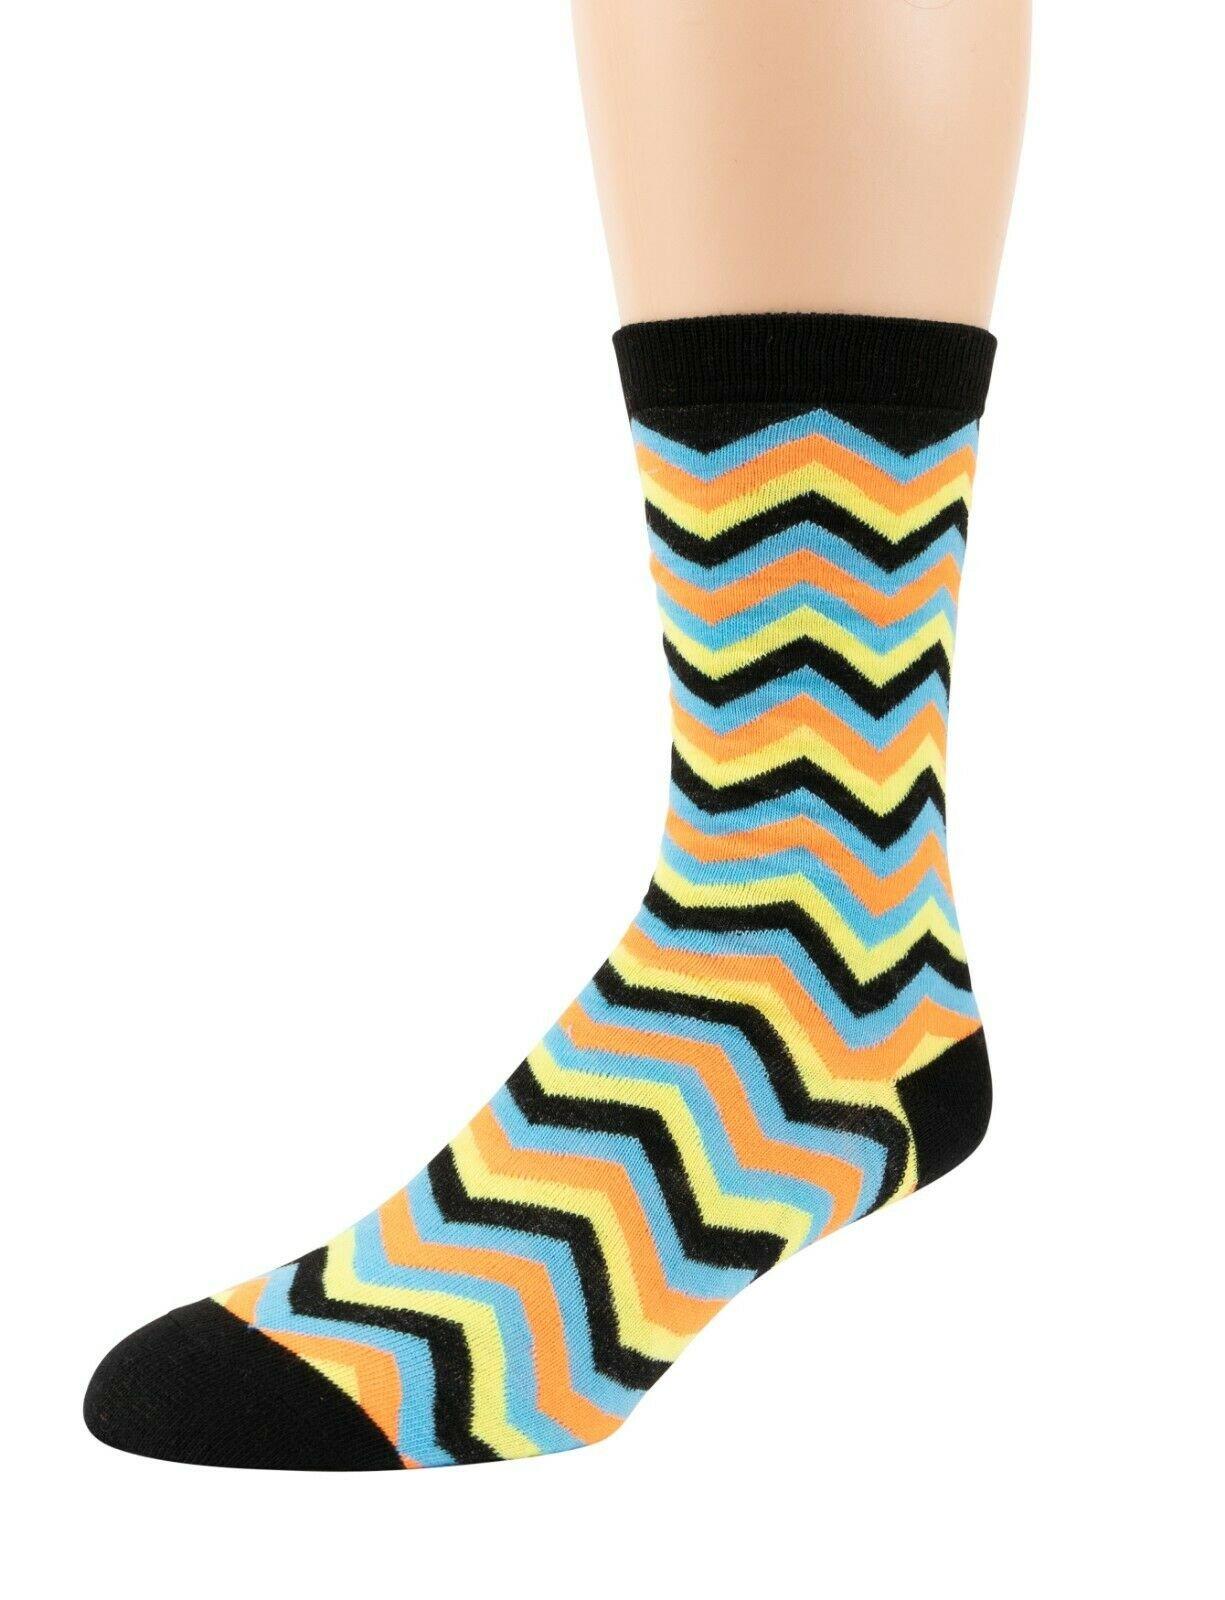 Mitch-Bogen-Mens-Cotton-Dress-Socks-Colorful-Fashion-Crew-Socks-8-Pack-Gift-Box thumbnail 56